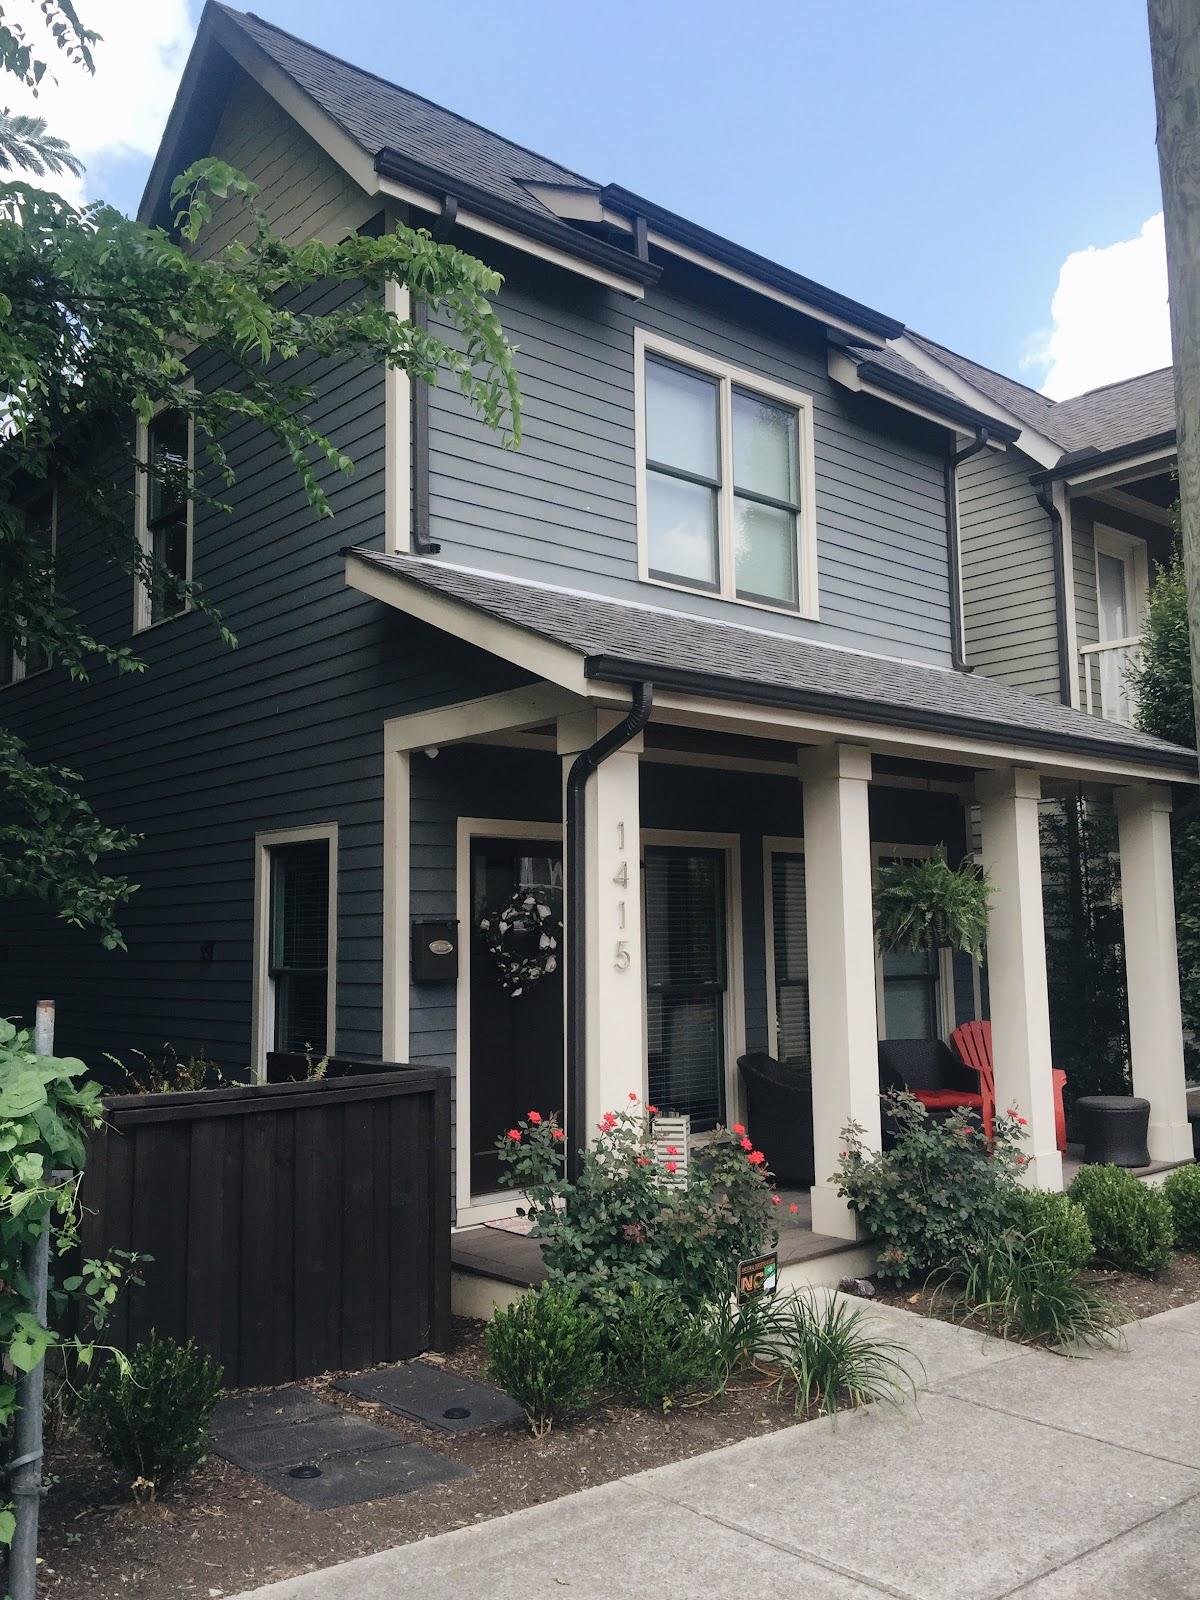 Home in Germantown, Nashville